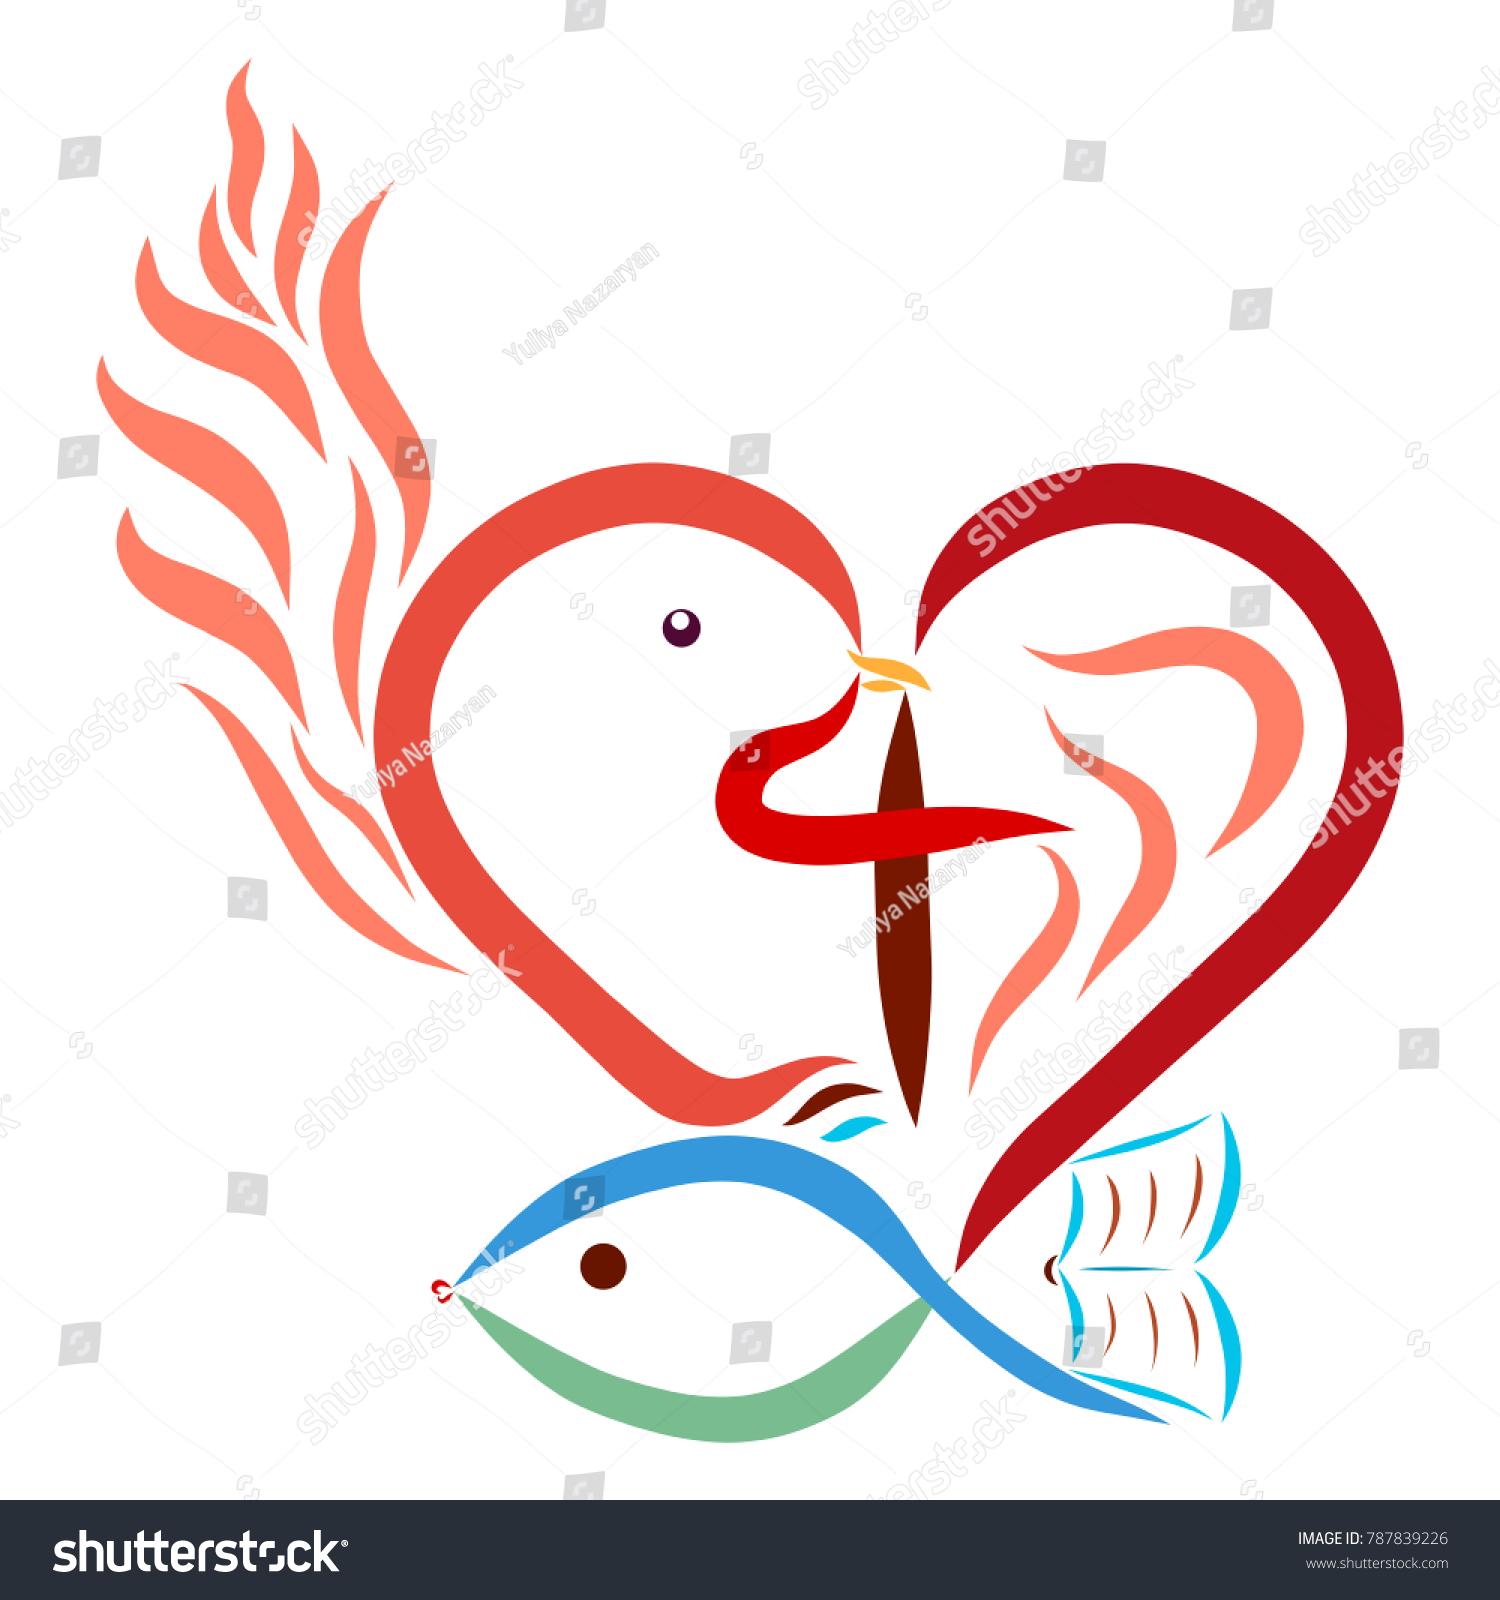 Christian symbolism heart cross dove fish stock illustration christian symbolism heart cross dove fish flame bible buycottarizona